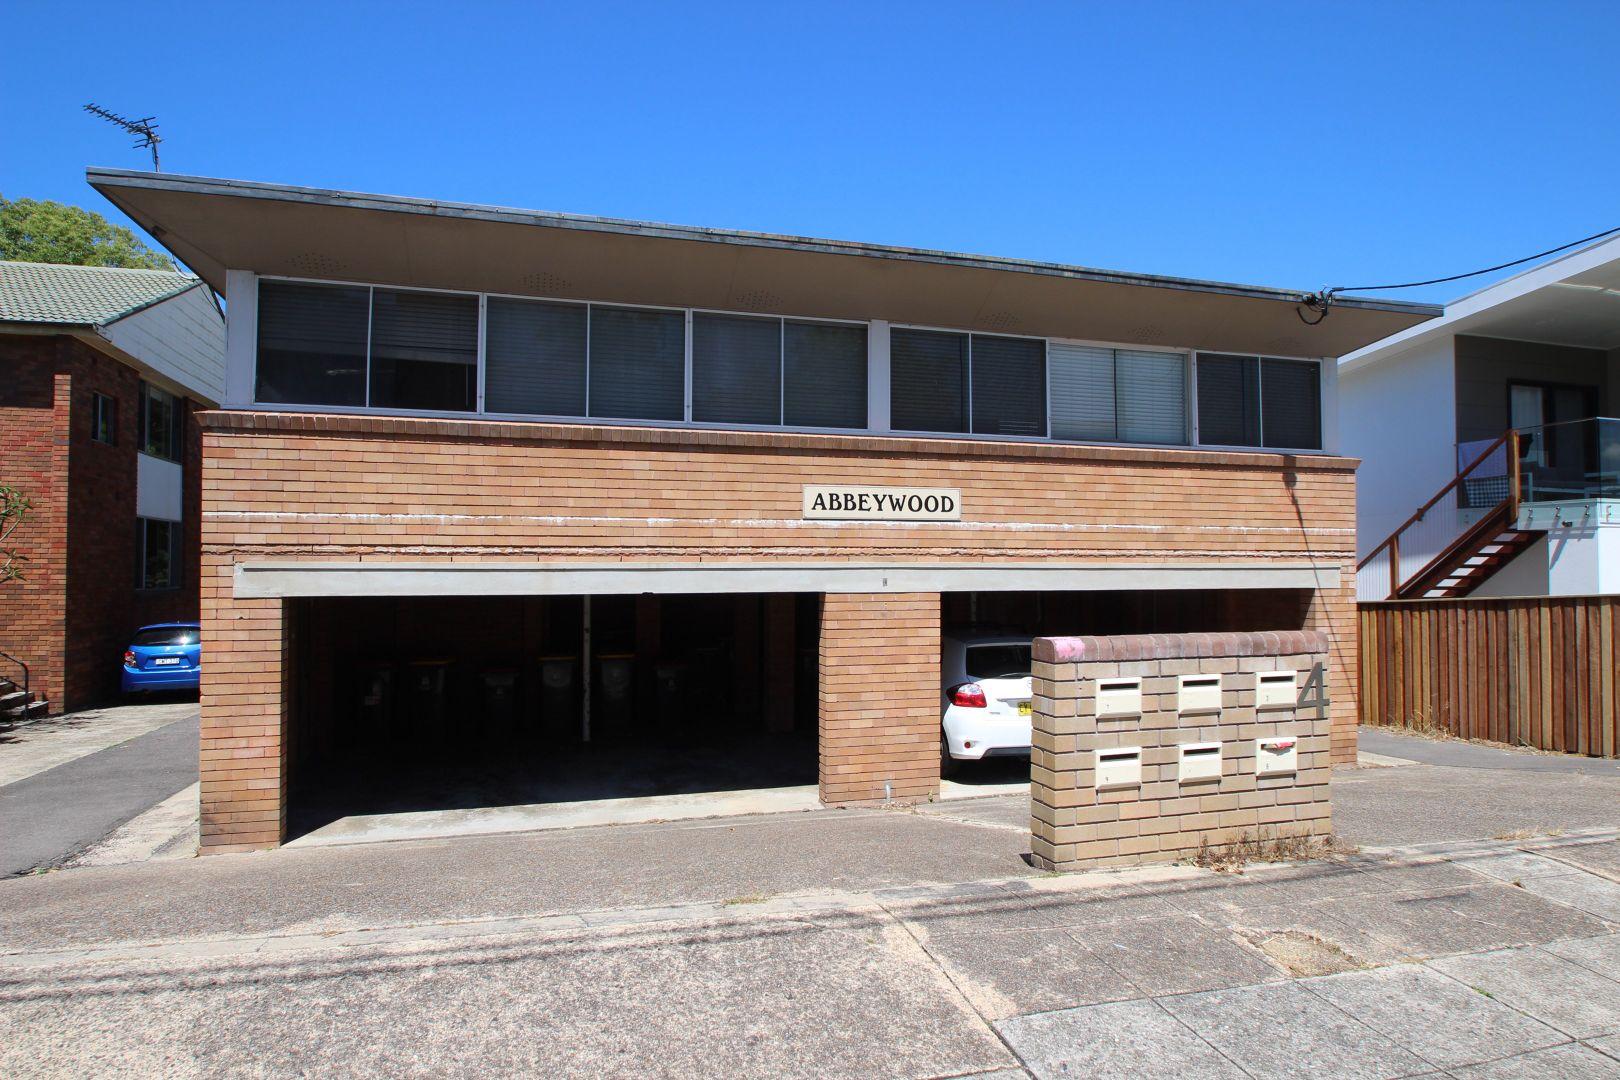 5/4 Mosbri Crescent, The Hill NSW 2300